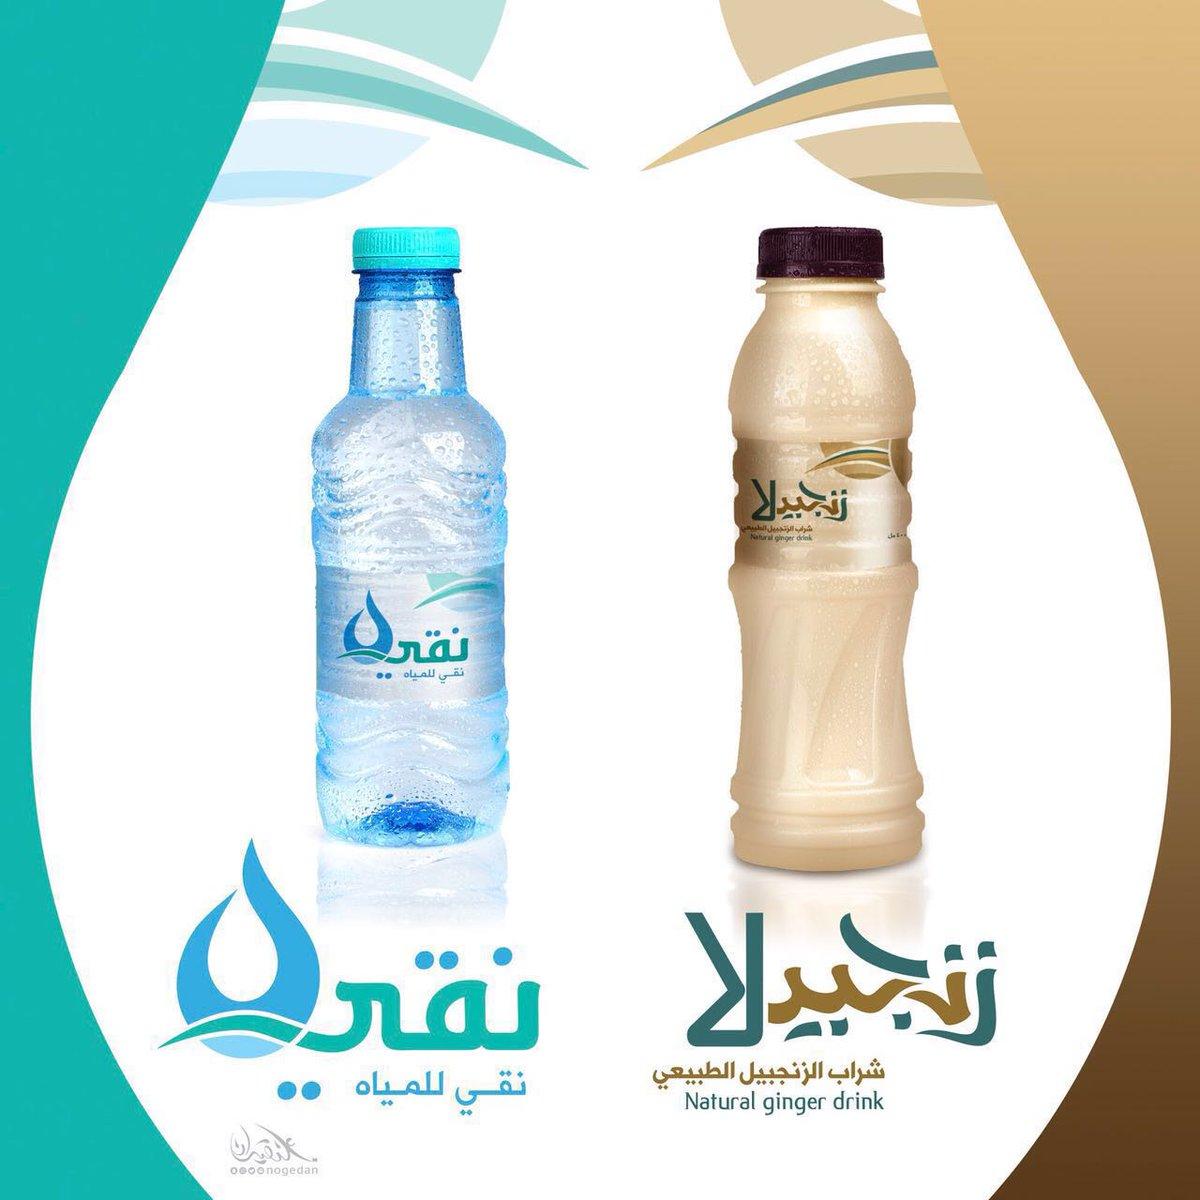 تحميل تطبيق مياه نقي 2